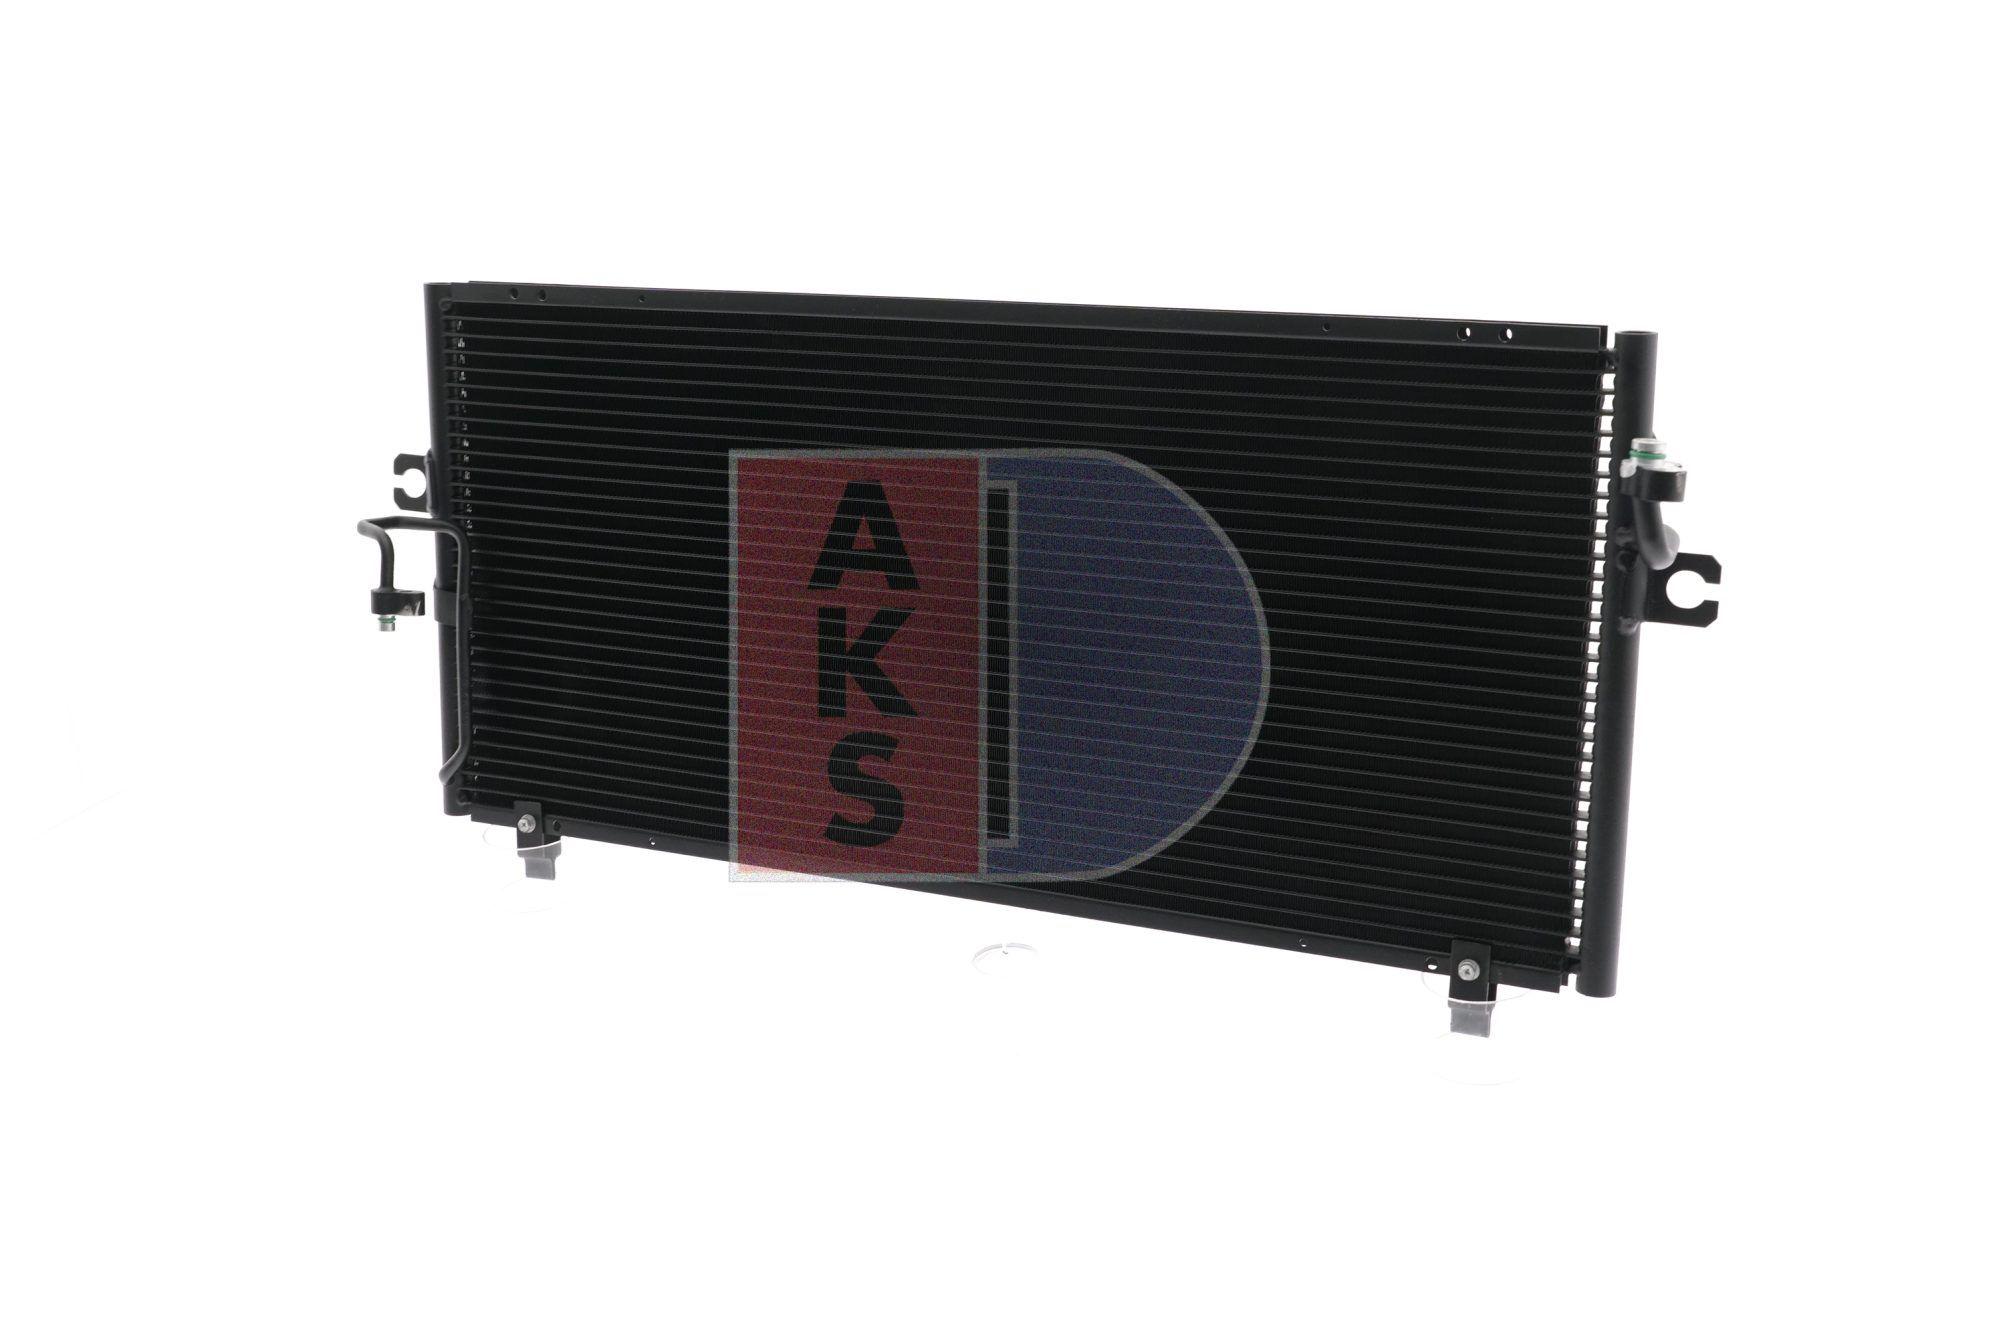 072420N Kondensator, Klimaanlage 4044455324706 profitabel